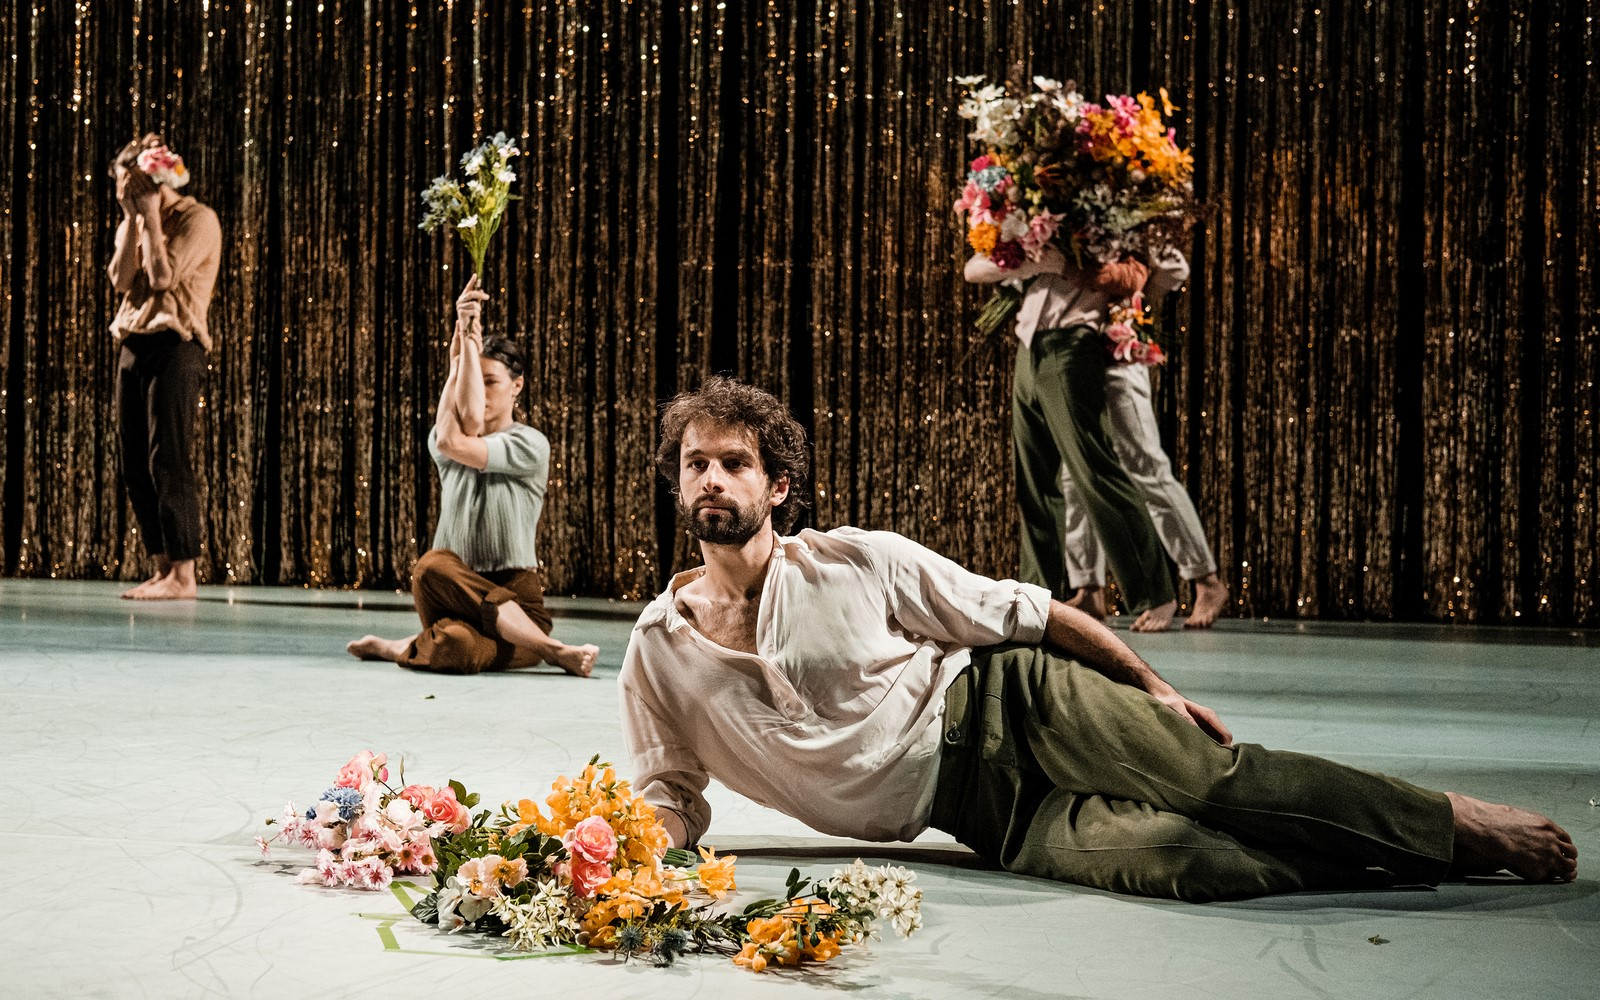 Anmeldelse: Two Lions and a Castle, Det Kongelige Teater  (Dansk Danseteater)